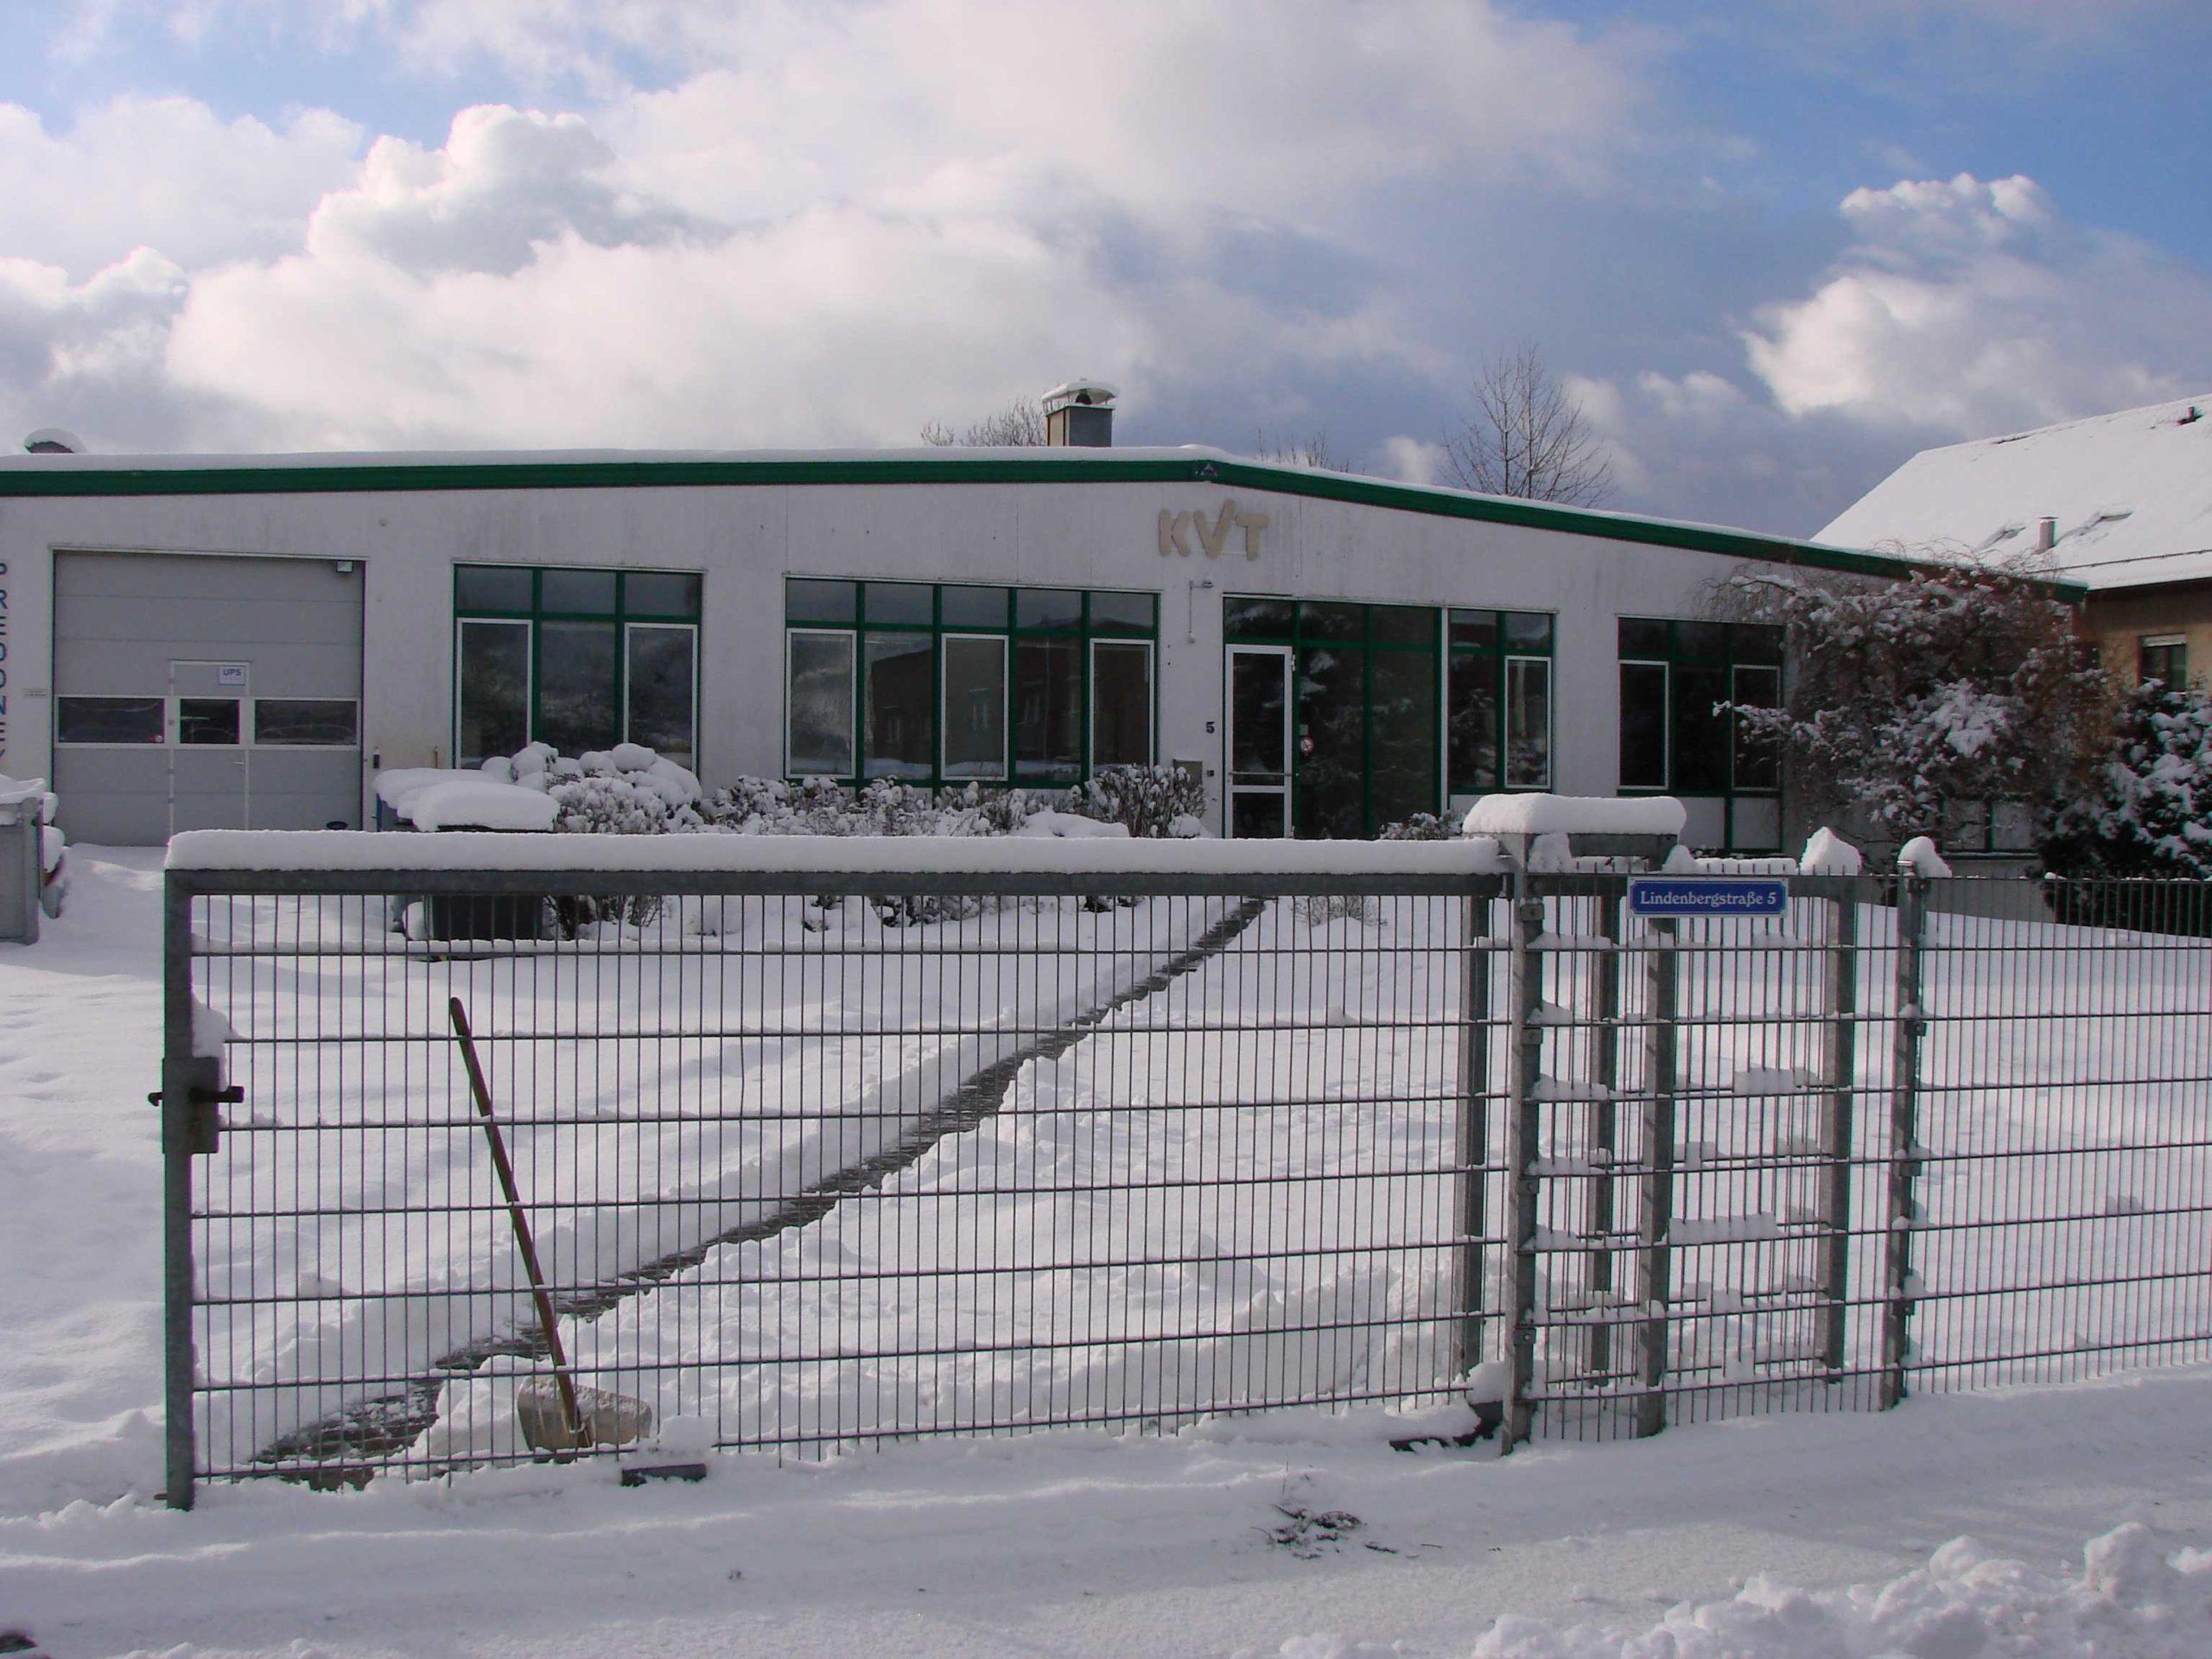 KVT GmbH Lindenbergstrasse 5 79199 Kirchzarten im Januar 2016